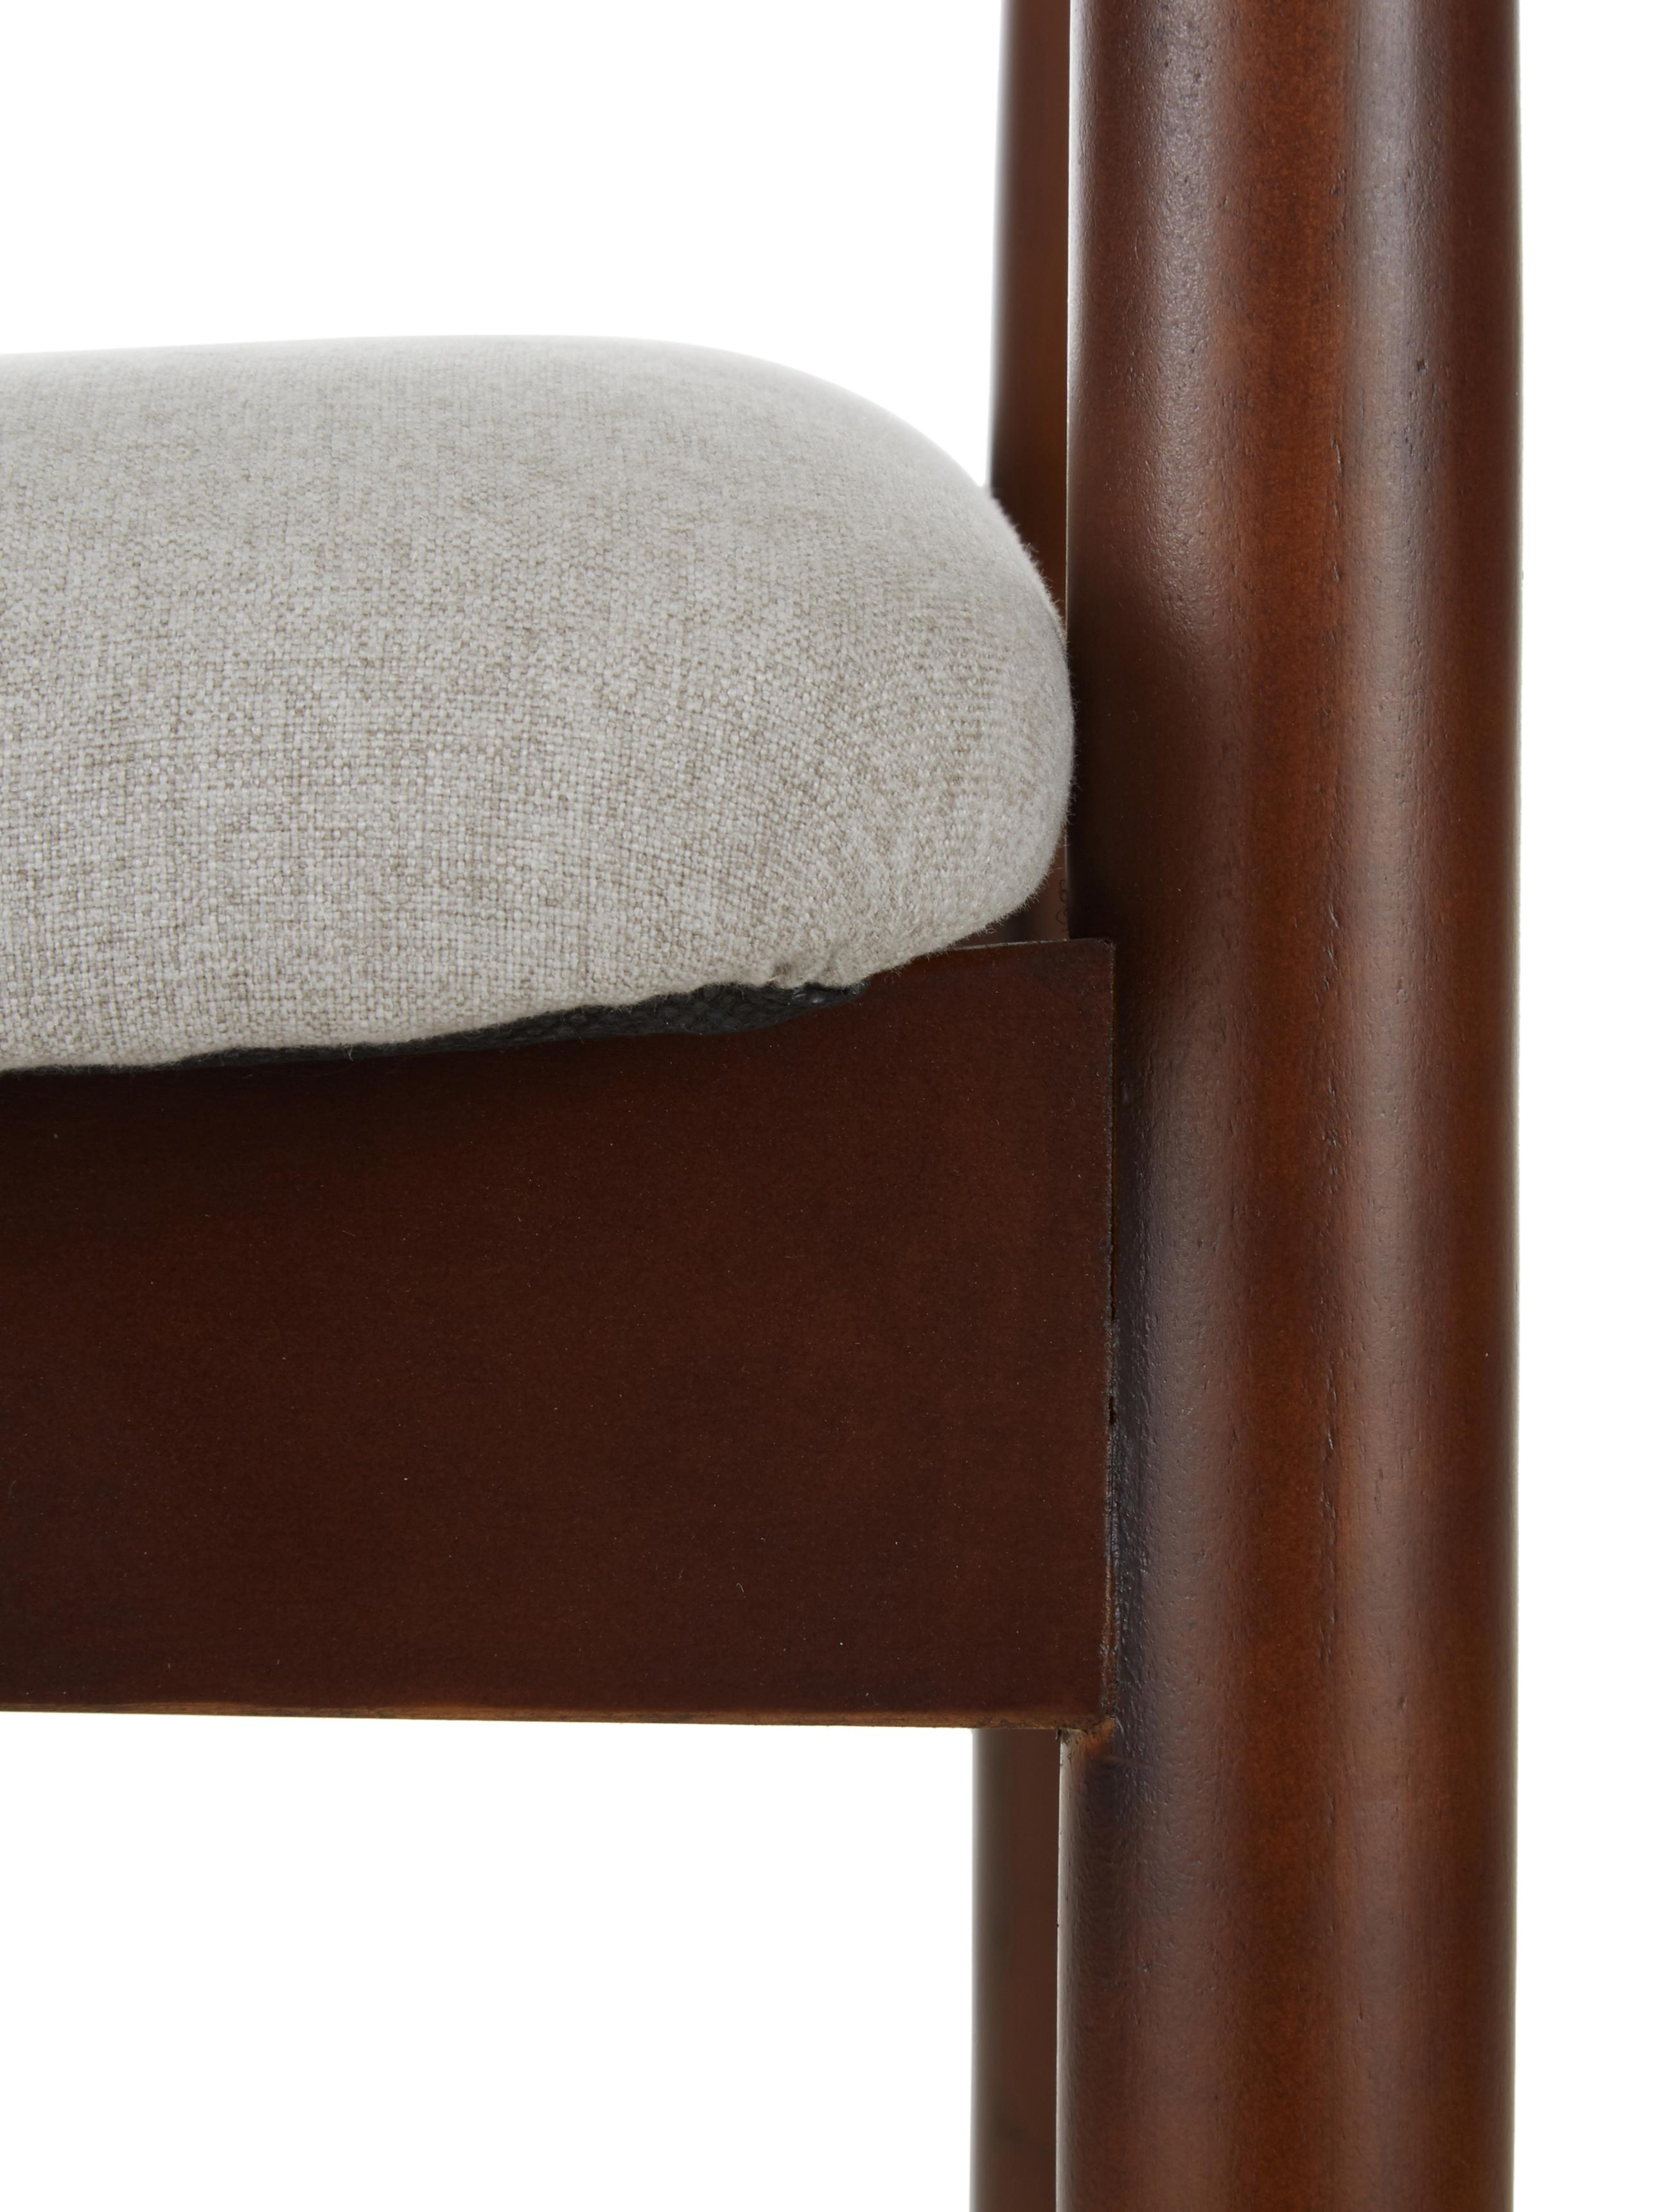 Armstoel Lloyd van donker berkenhout, Bekleding: polyester, Frame: berkenhout, multiplex, Beige, berkenhoutkleurig, B 57 x D 54 cm